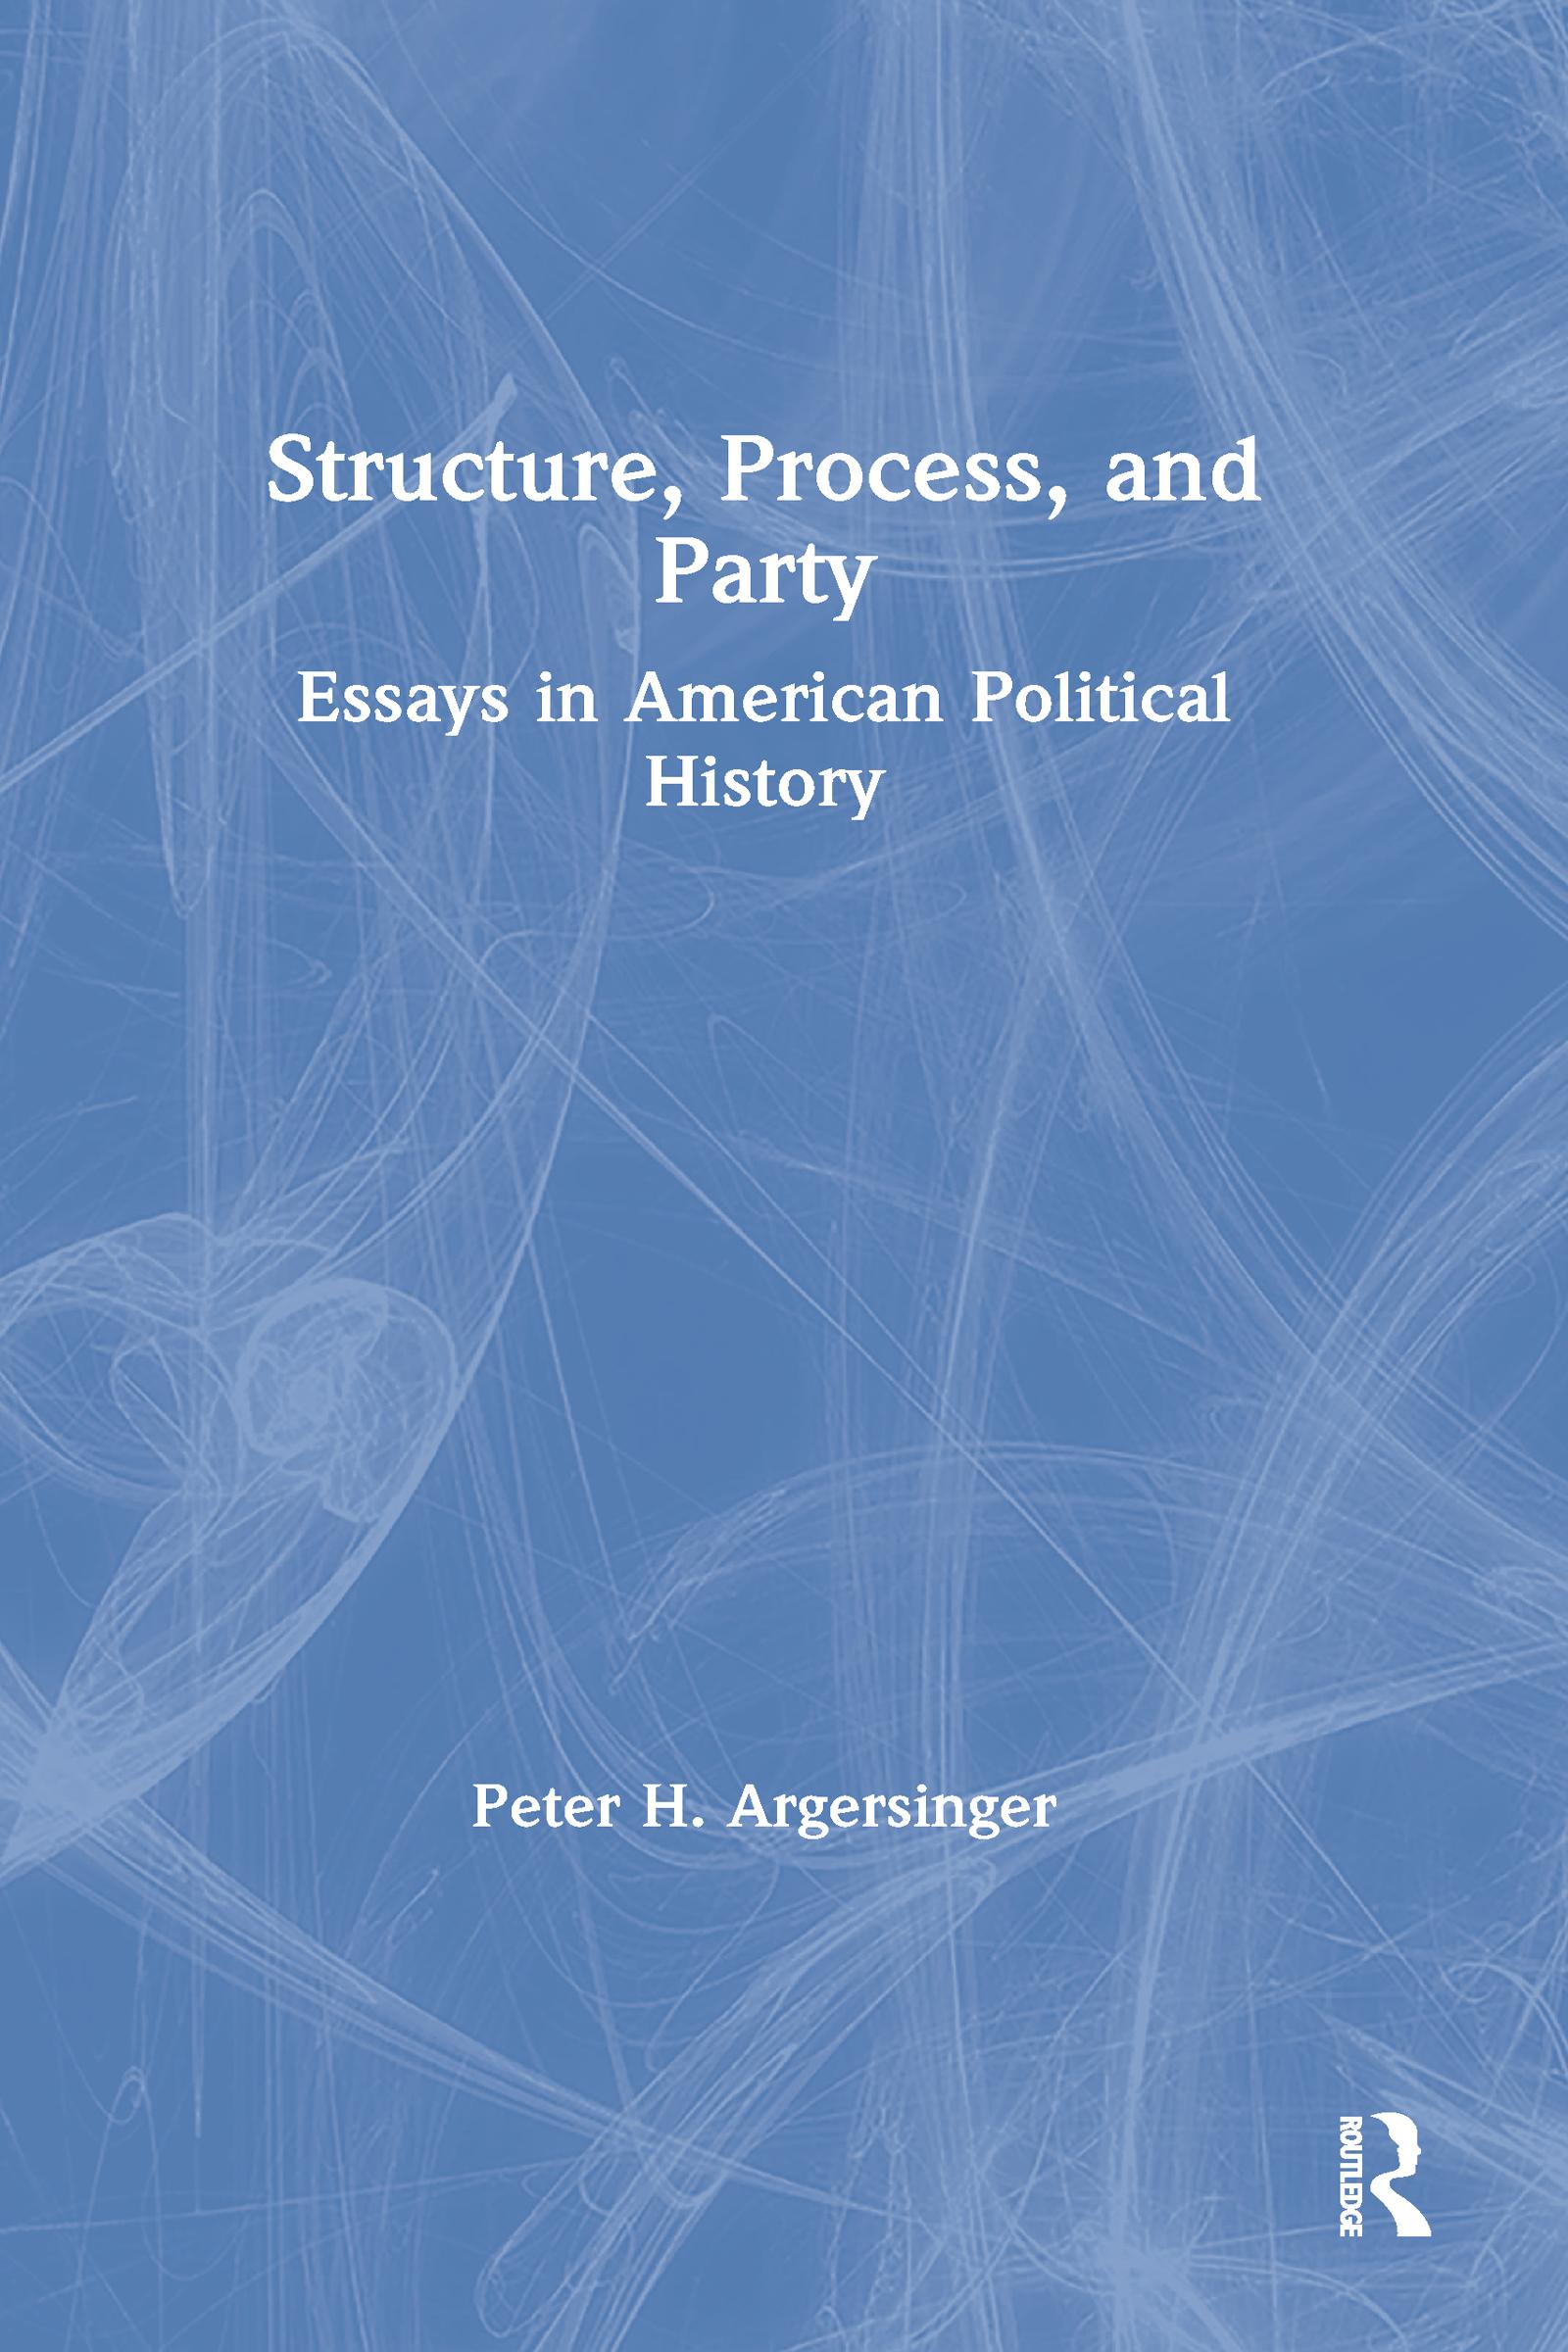 Electoral Processes in American Politics